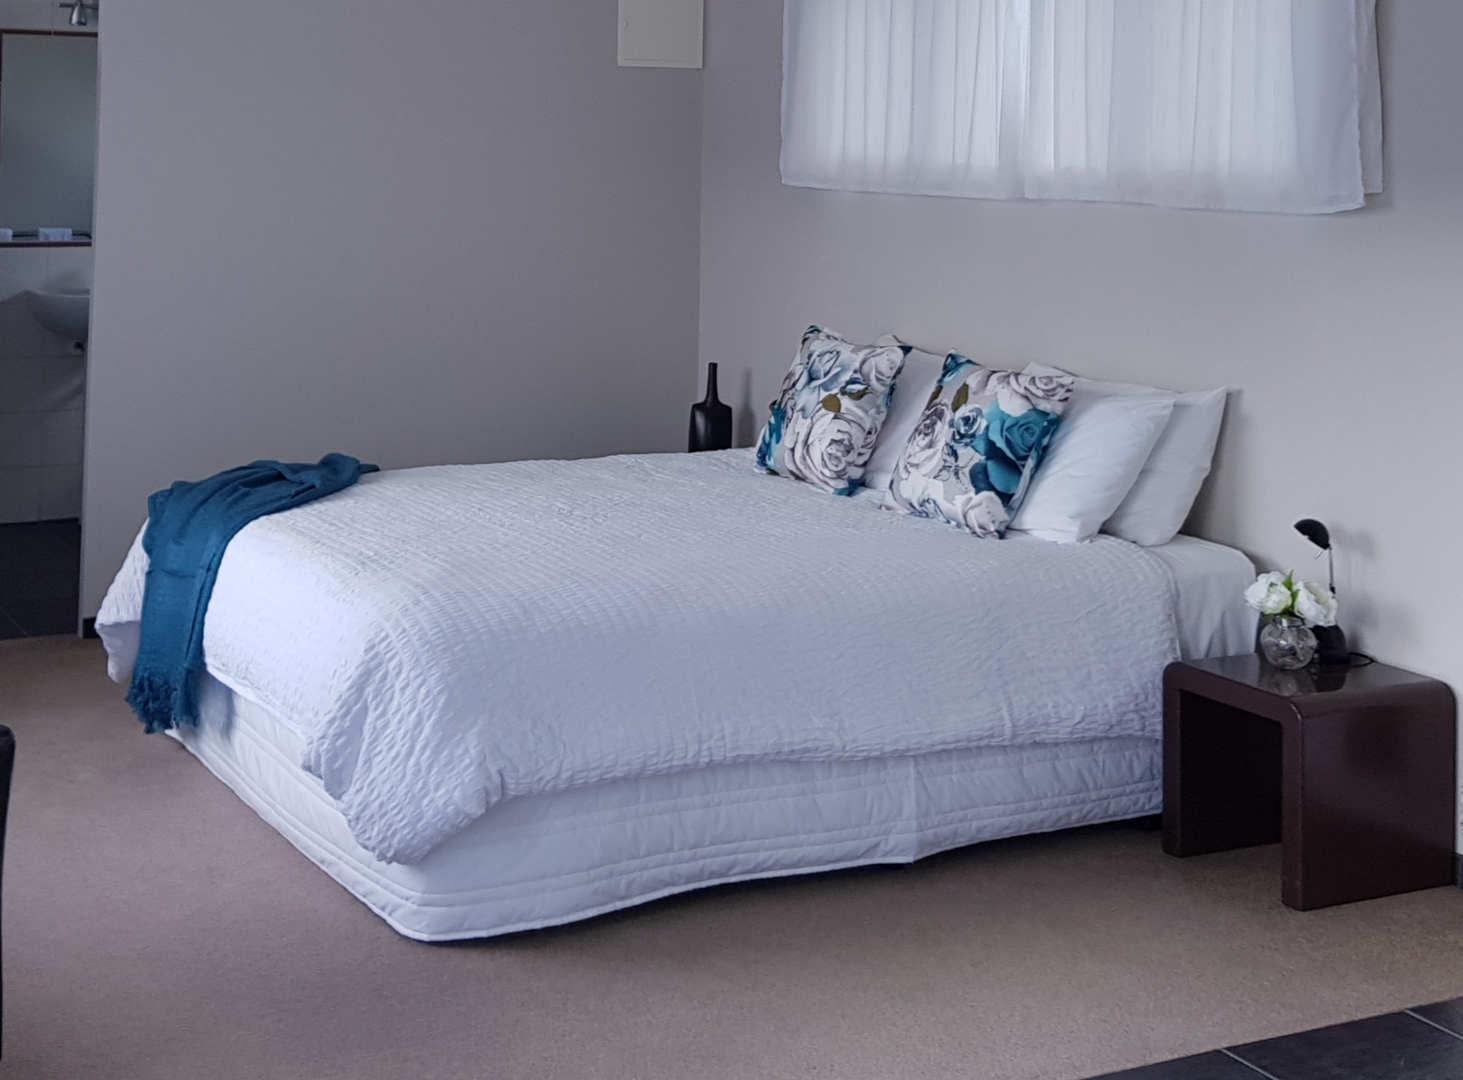 Room one - bed.jpg